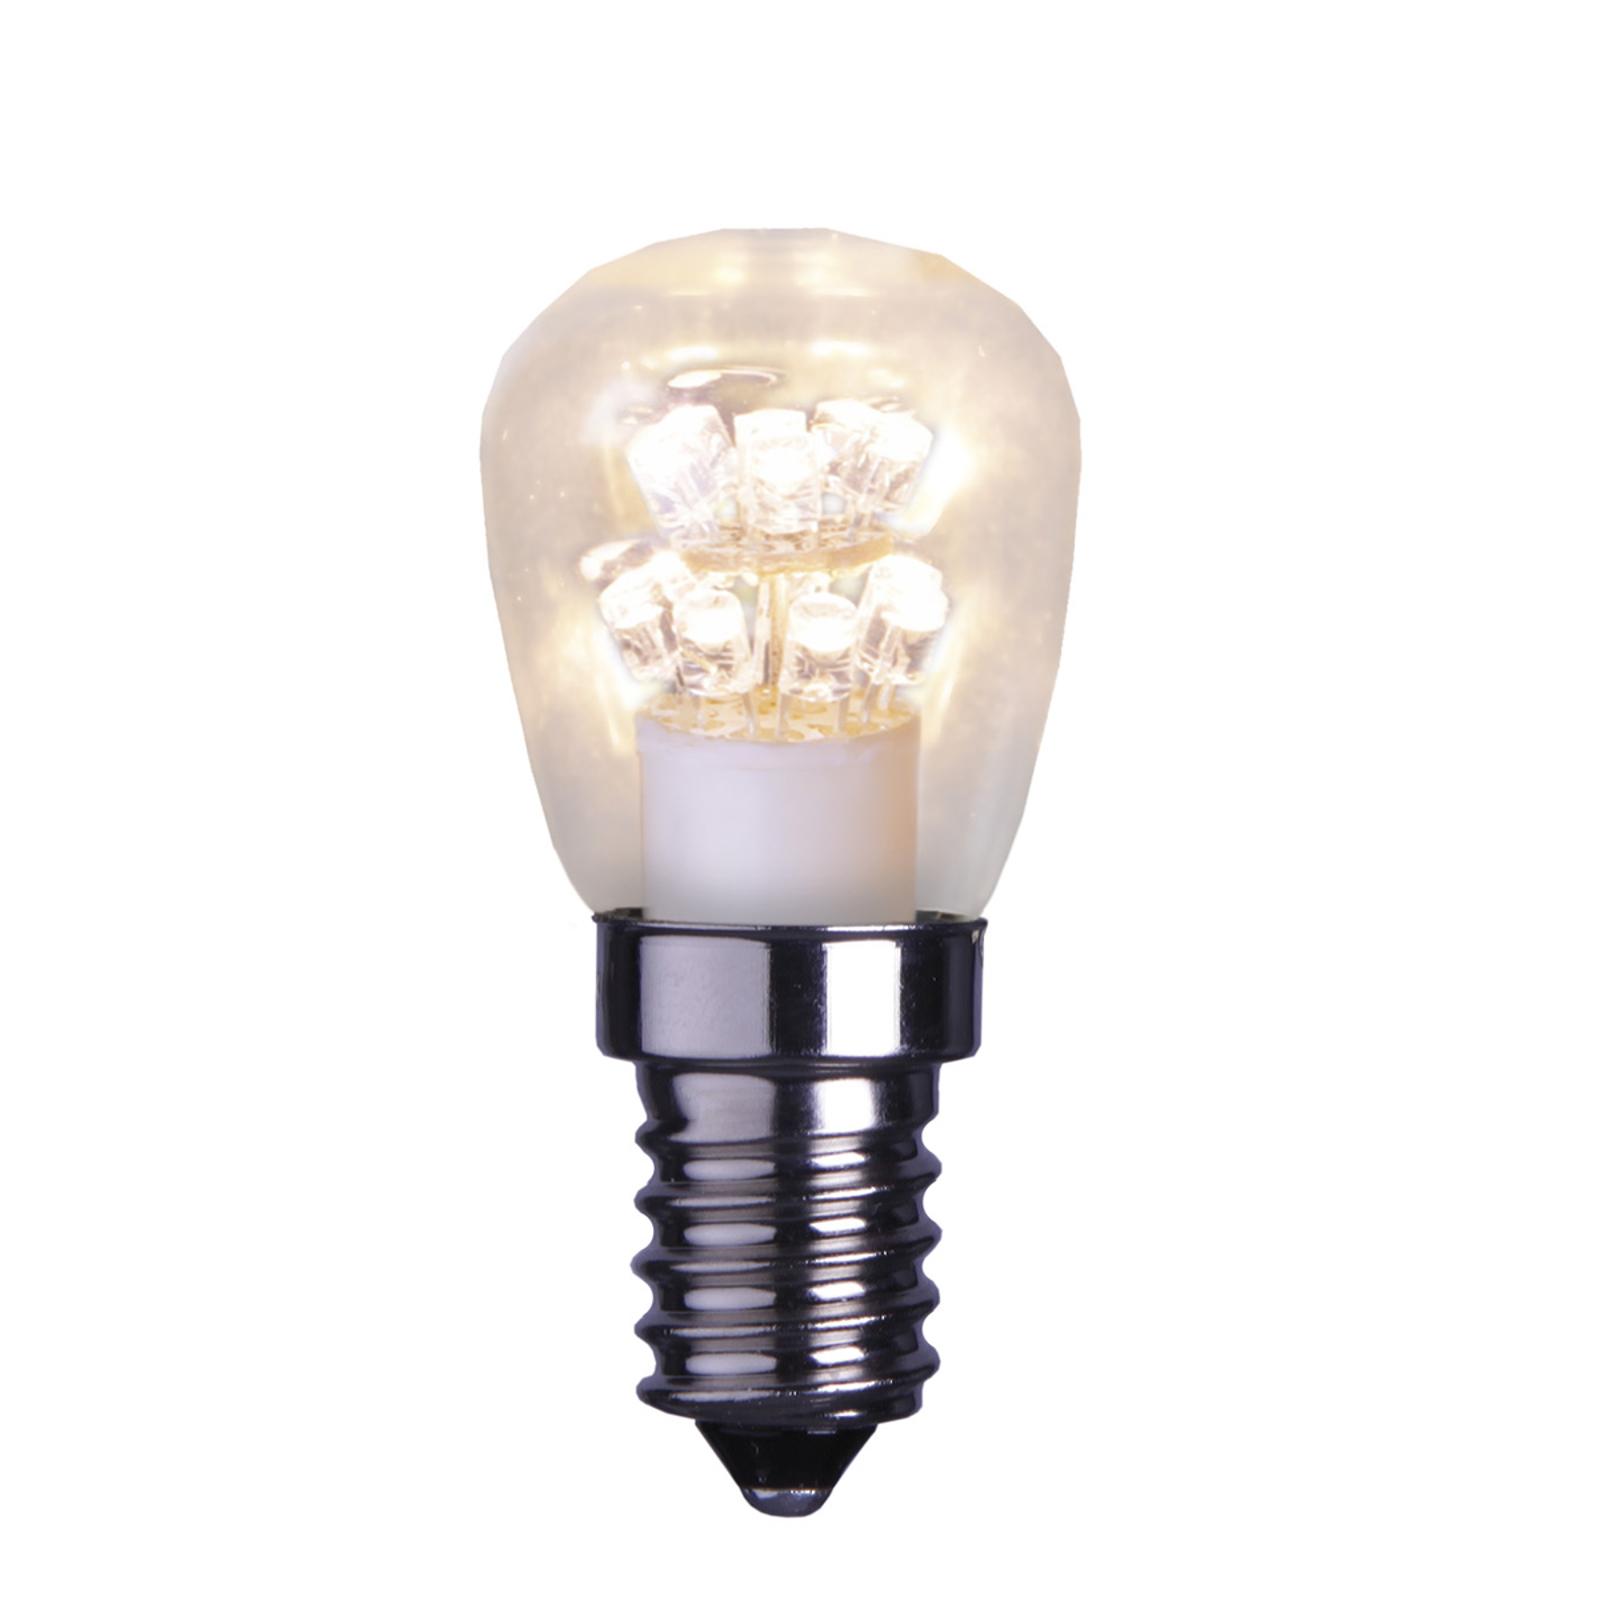 Lampe LED E14 0,7W transparente blanc chaud 2100 K